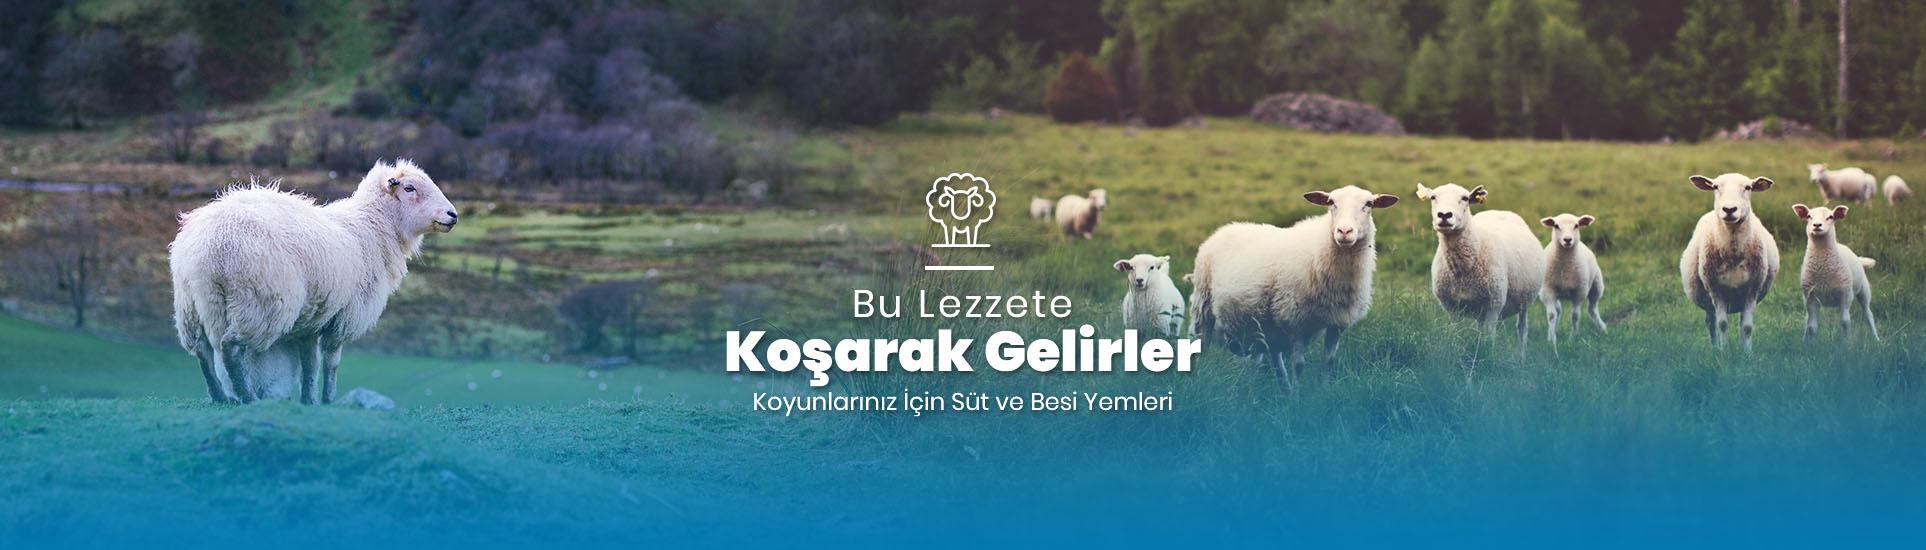 http://cayliyem.com.tr/Slayt - 1